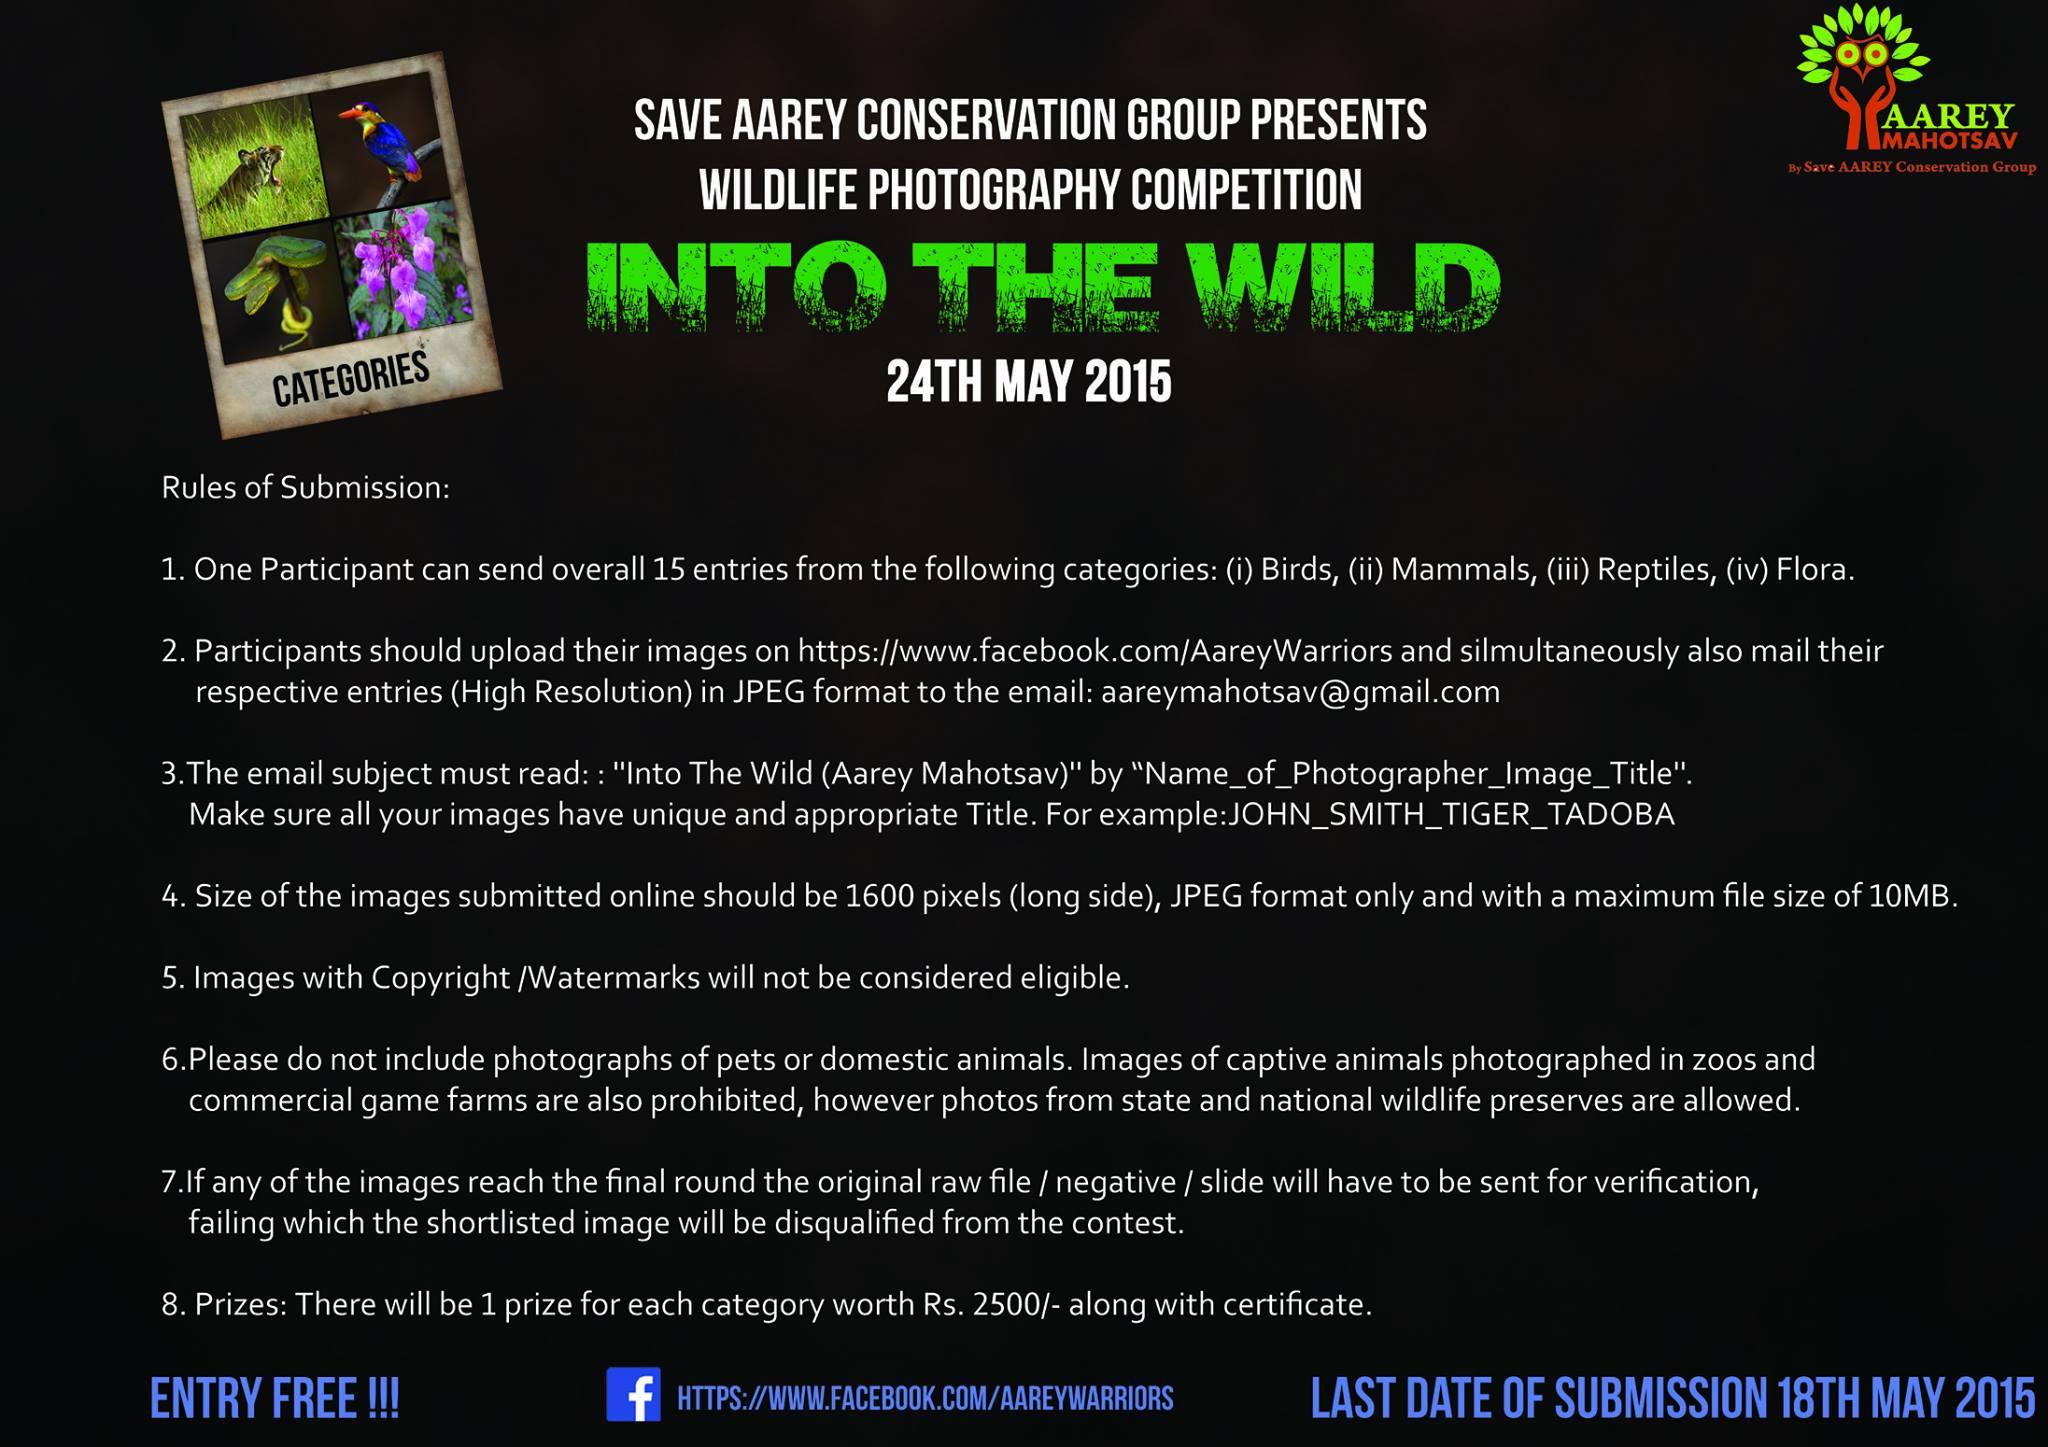 'Into The Wild' - Wildlife Photography Exhibition